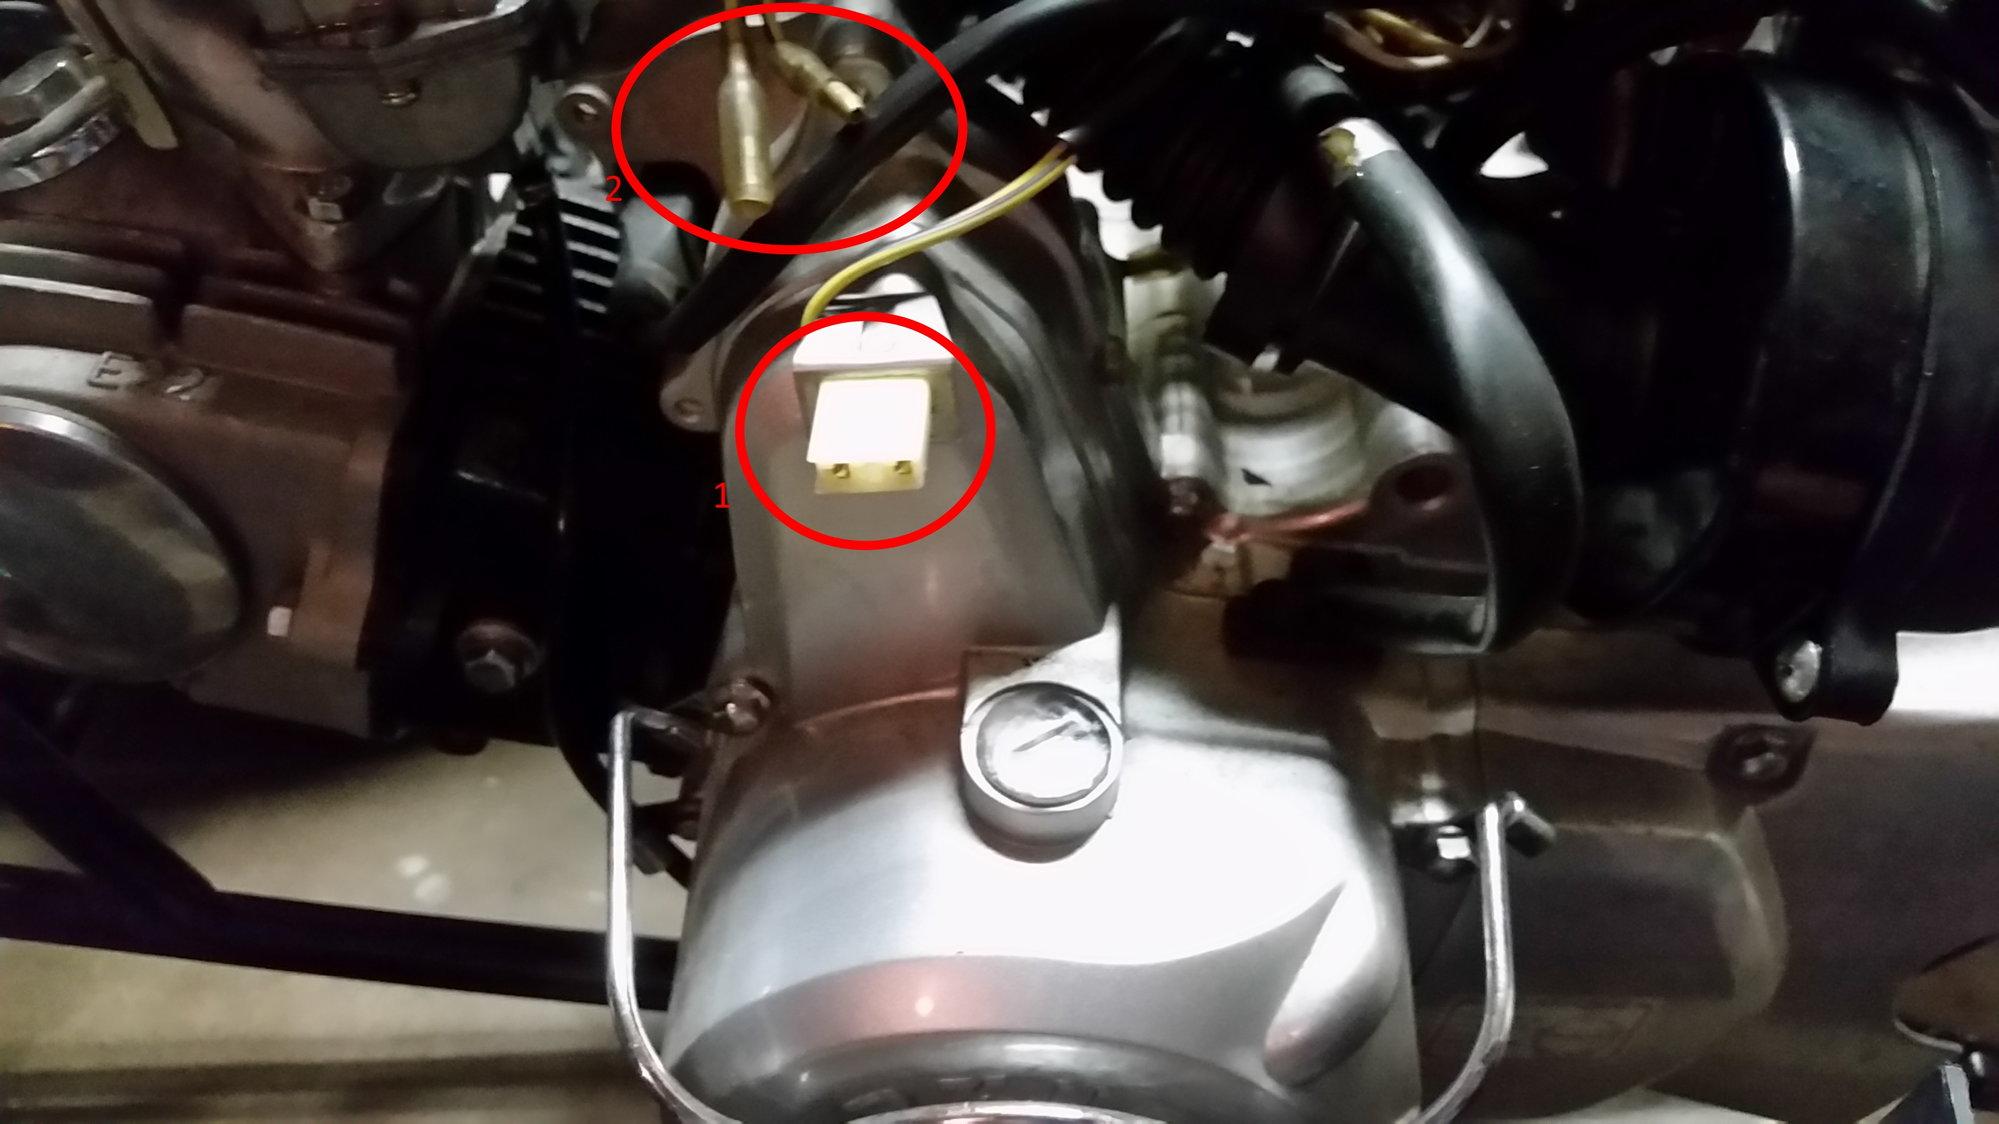 Kazuma Meerkat 50cc    Redcat Engine Starts For Few Seconds Only